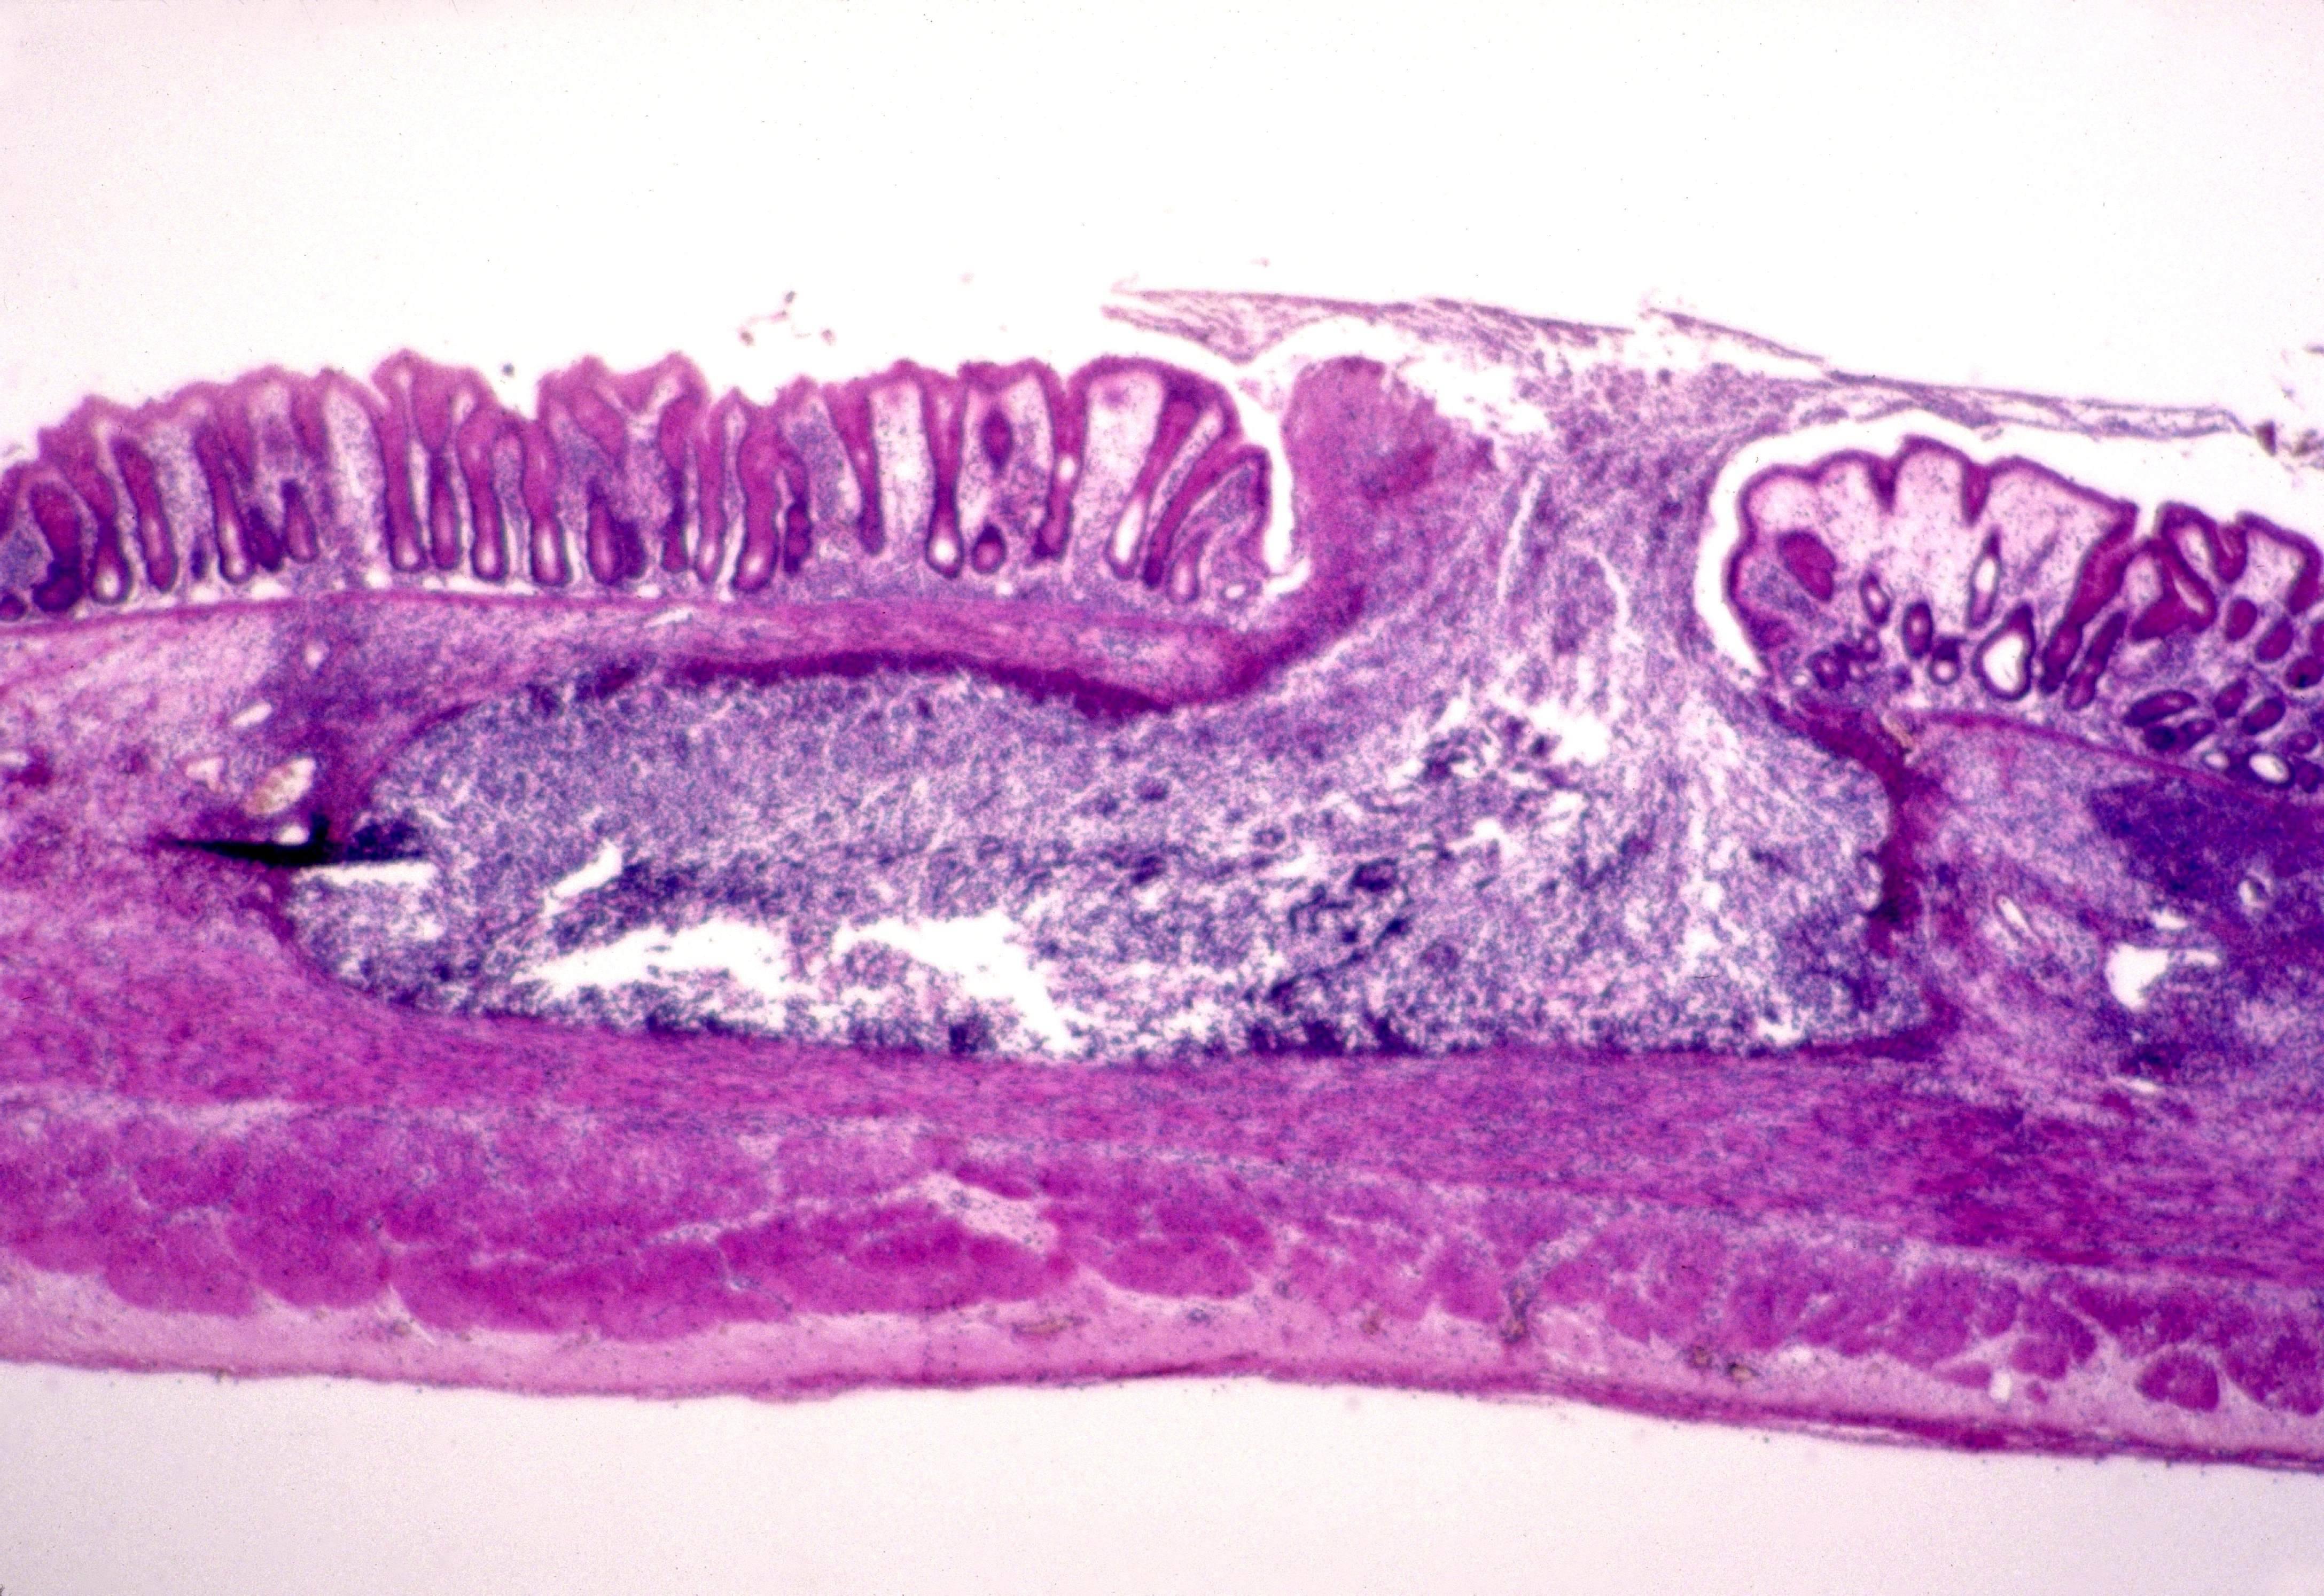 Кишечная амеба: ее диагностика и лечение